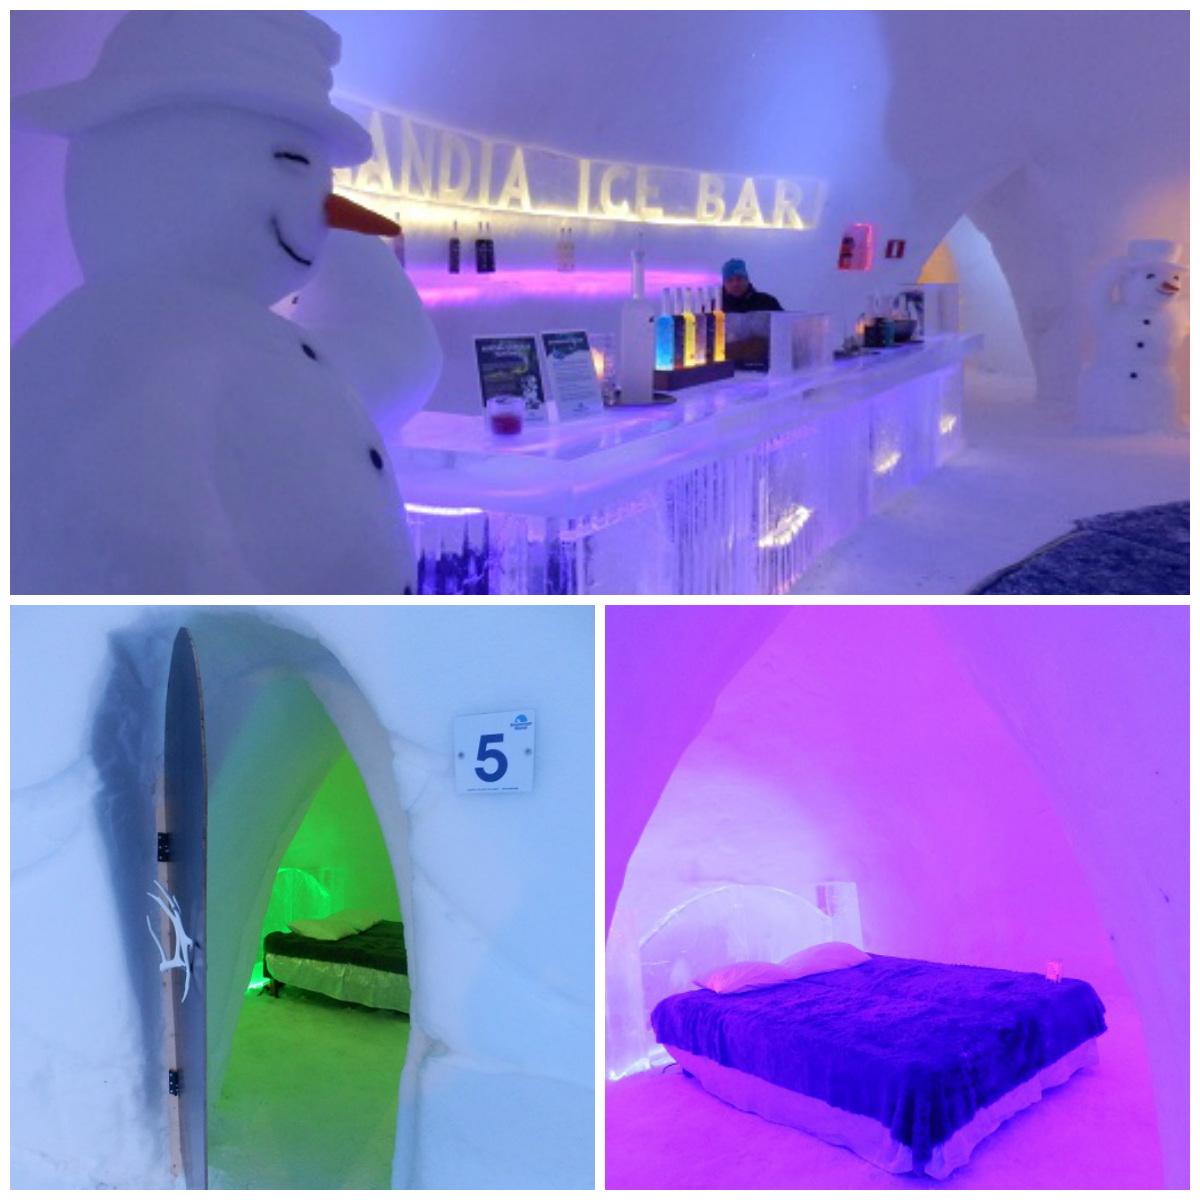 lodowy bar rovaniemi snowmanworld hotel iglo